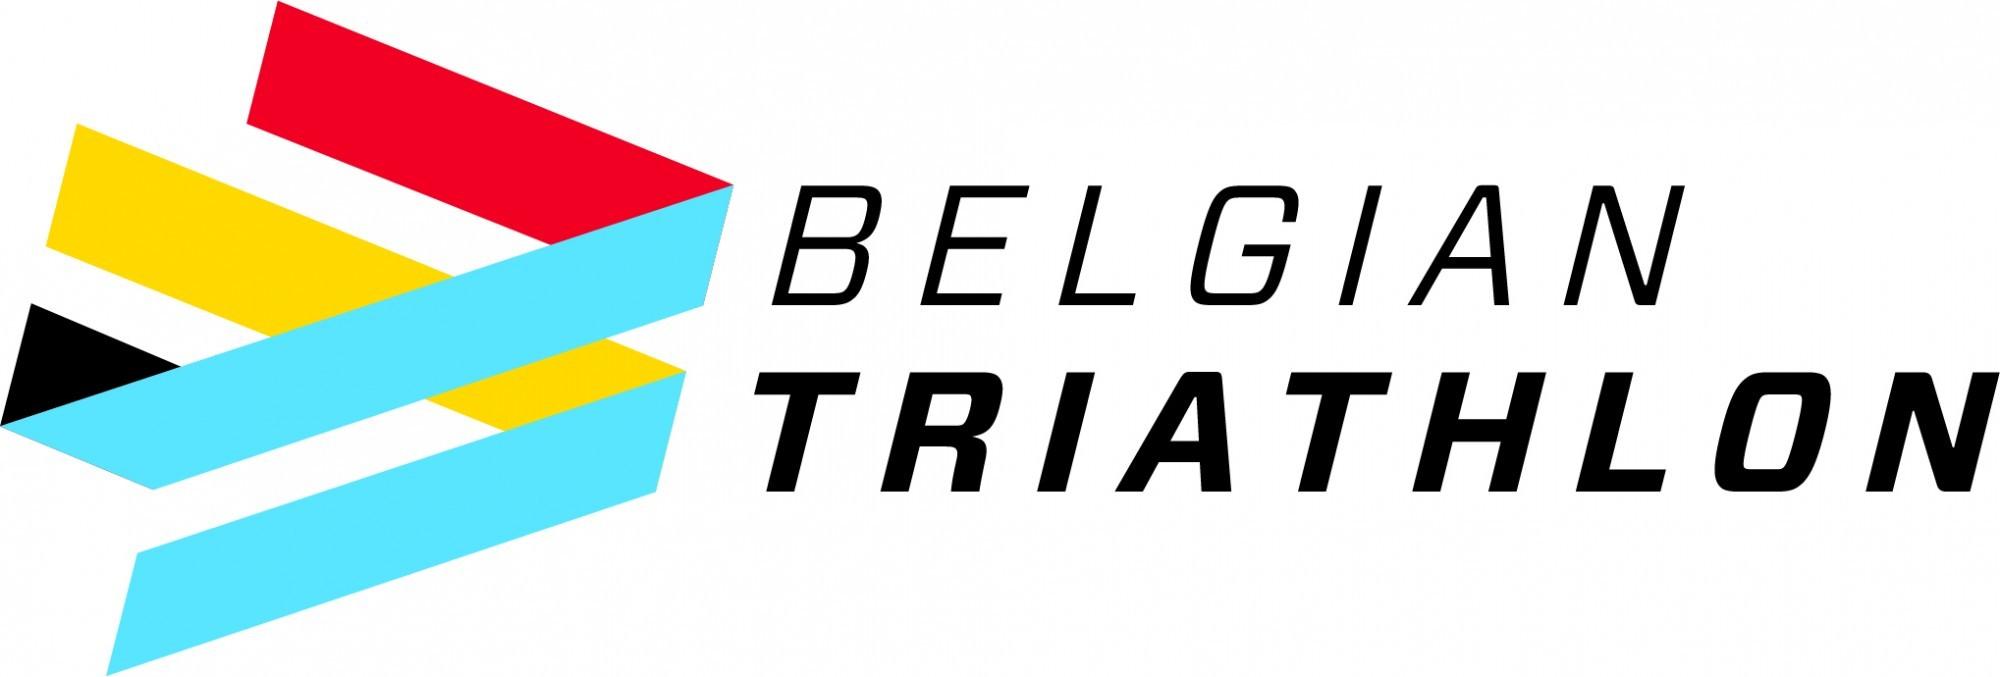 Belgian Triathlon logo